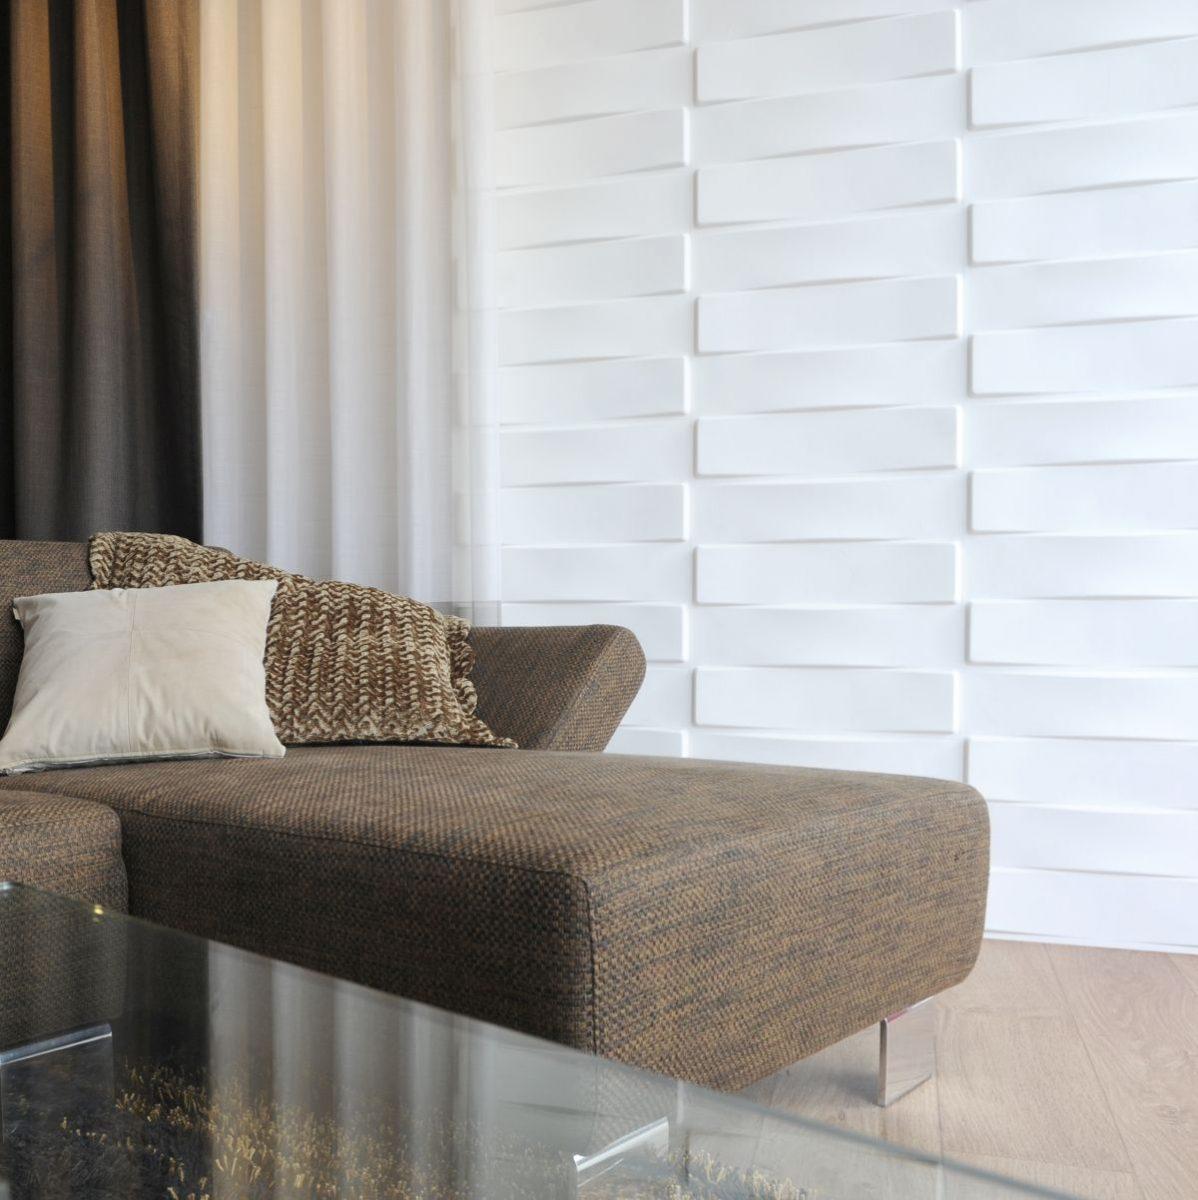 12lagoon_vaults-design-3d-wallart-white-wallpaper-3m-square-1200x1200.jpg